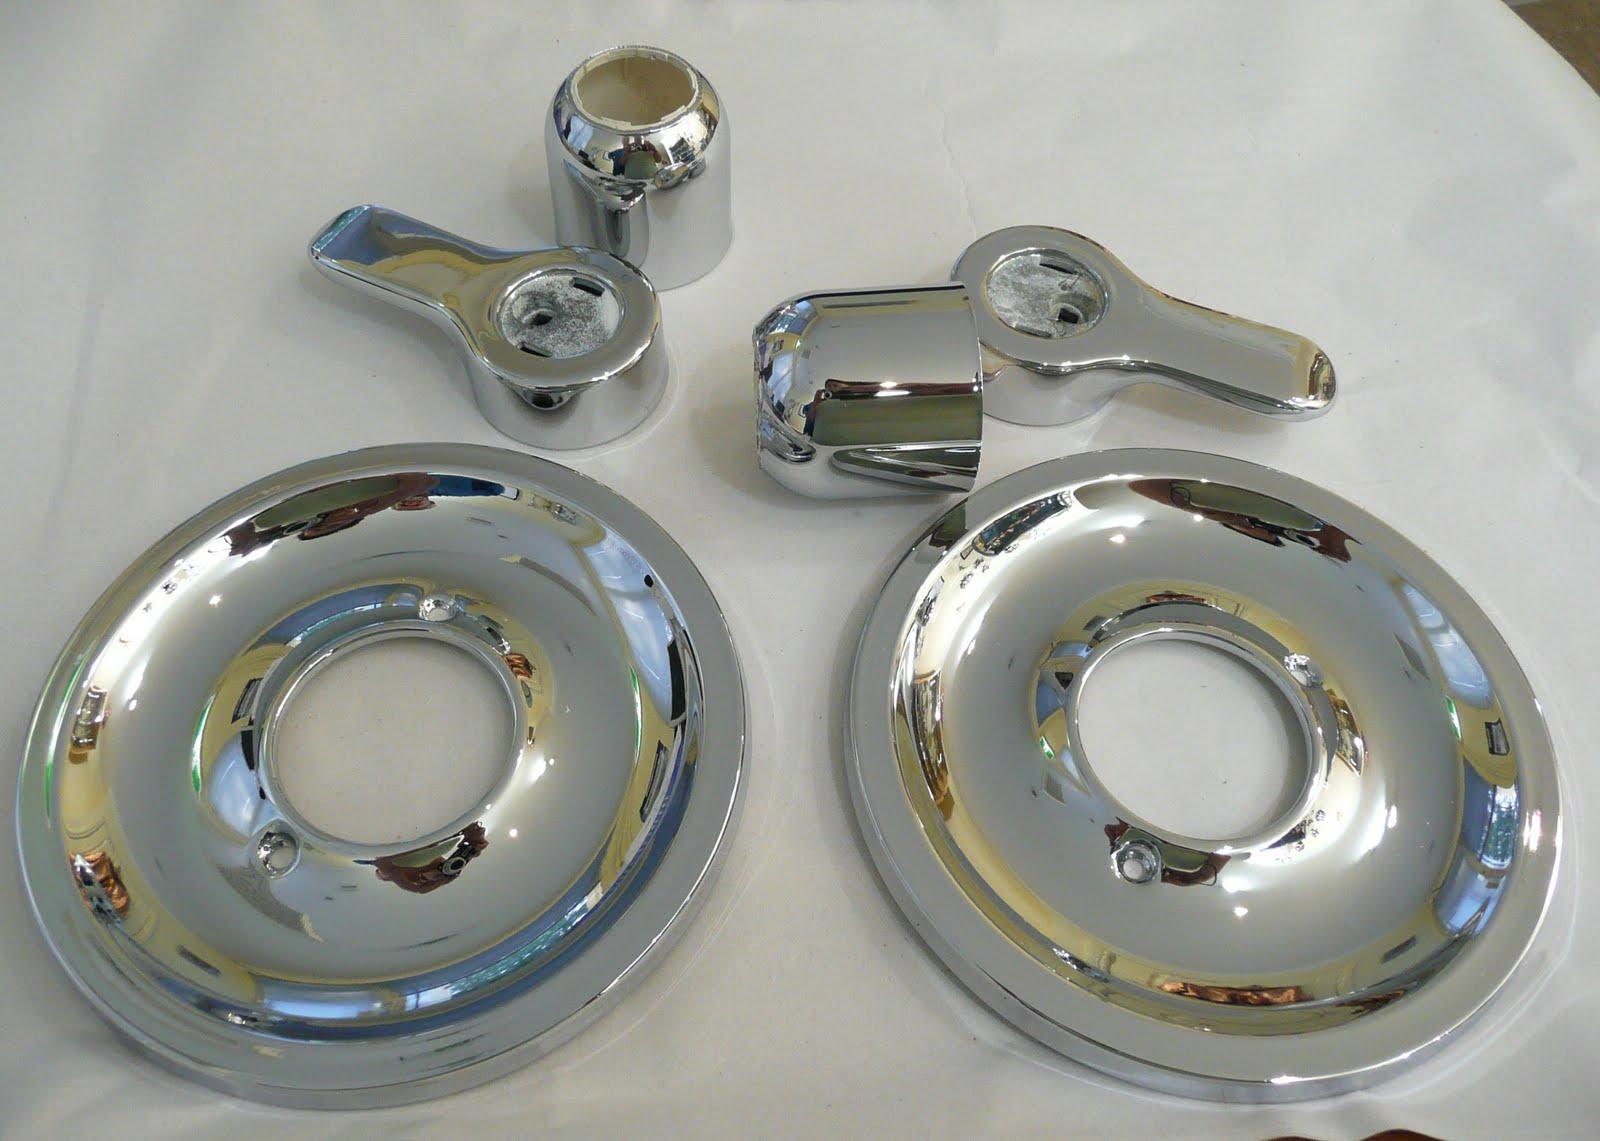 chrome plate plastic car parts. Black Bedroom Furniture Sets. Home Design Ideas